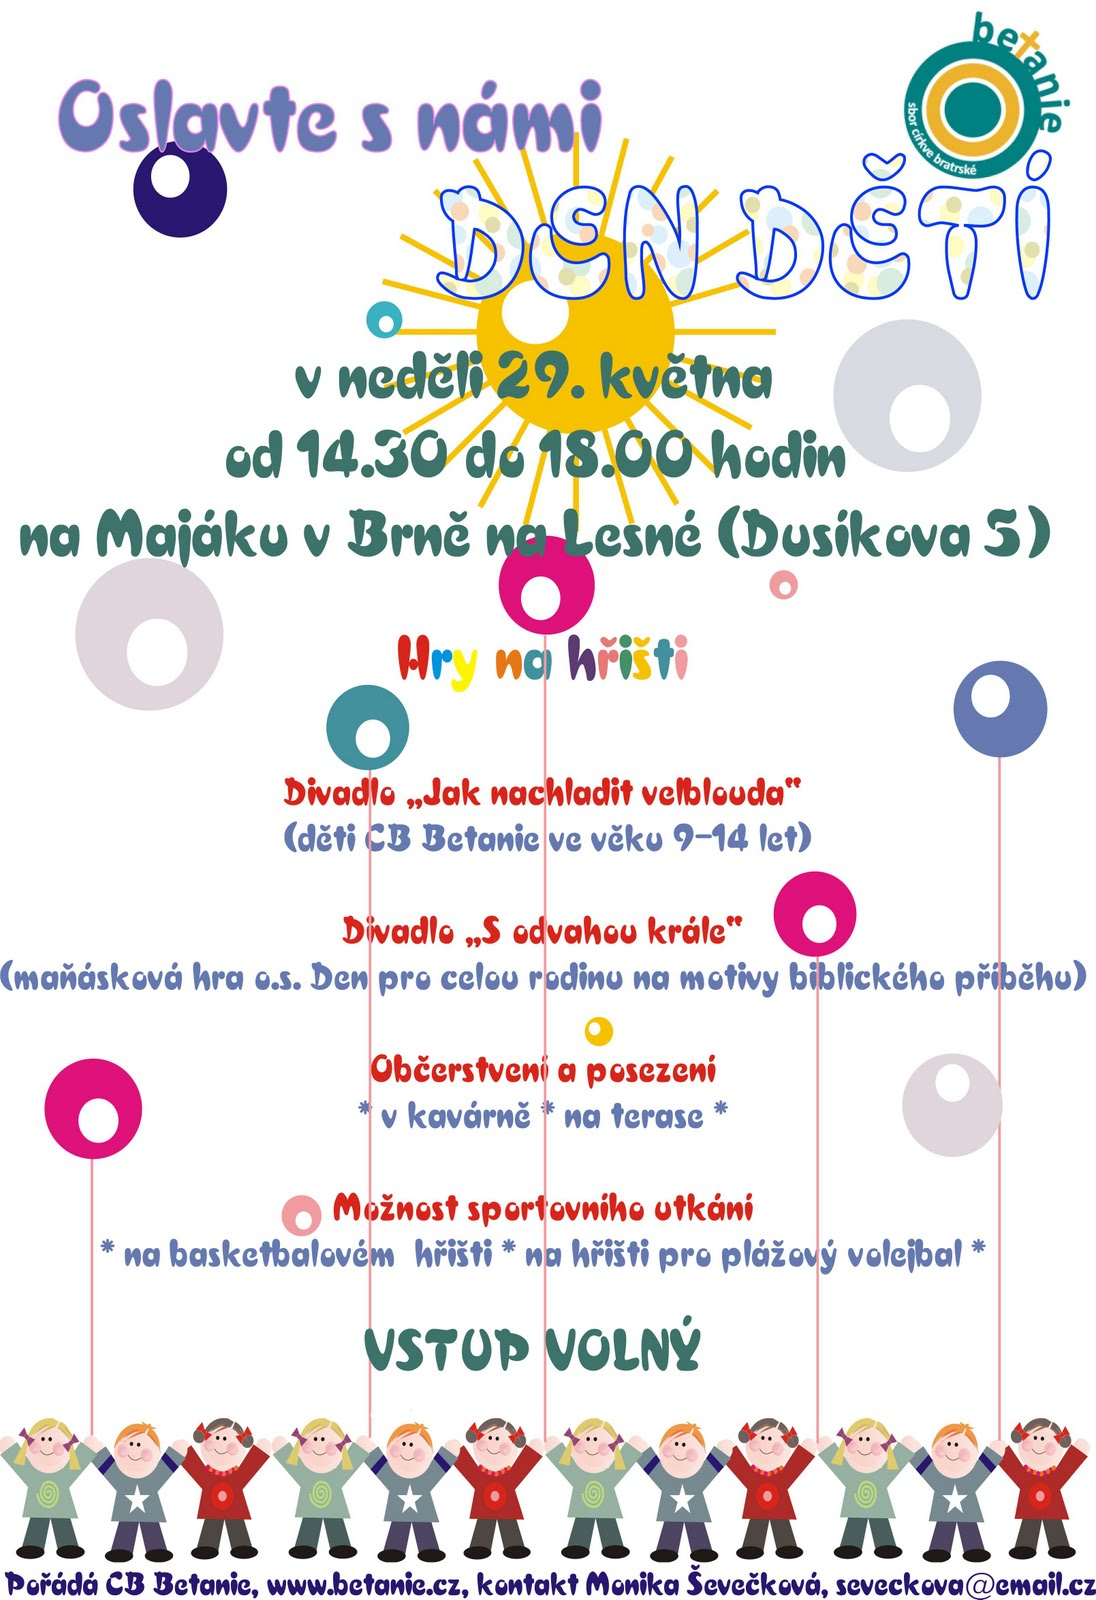 pozvanka_rodinne_odpoledne_Majak_11_05_29.jpg